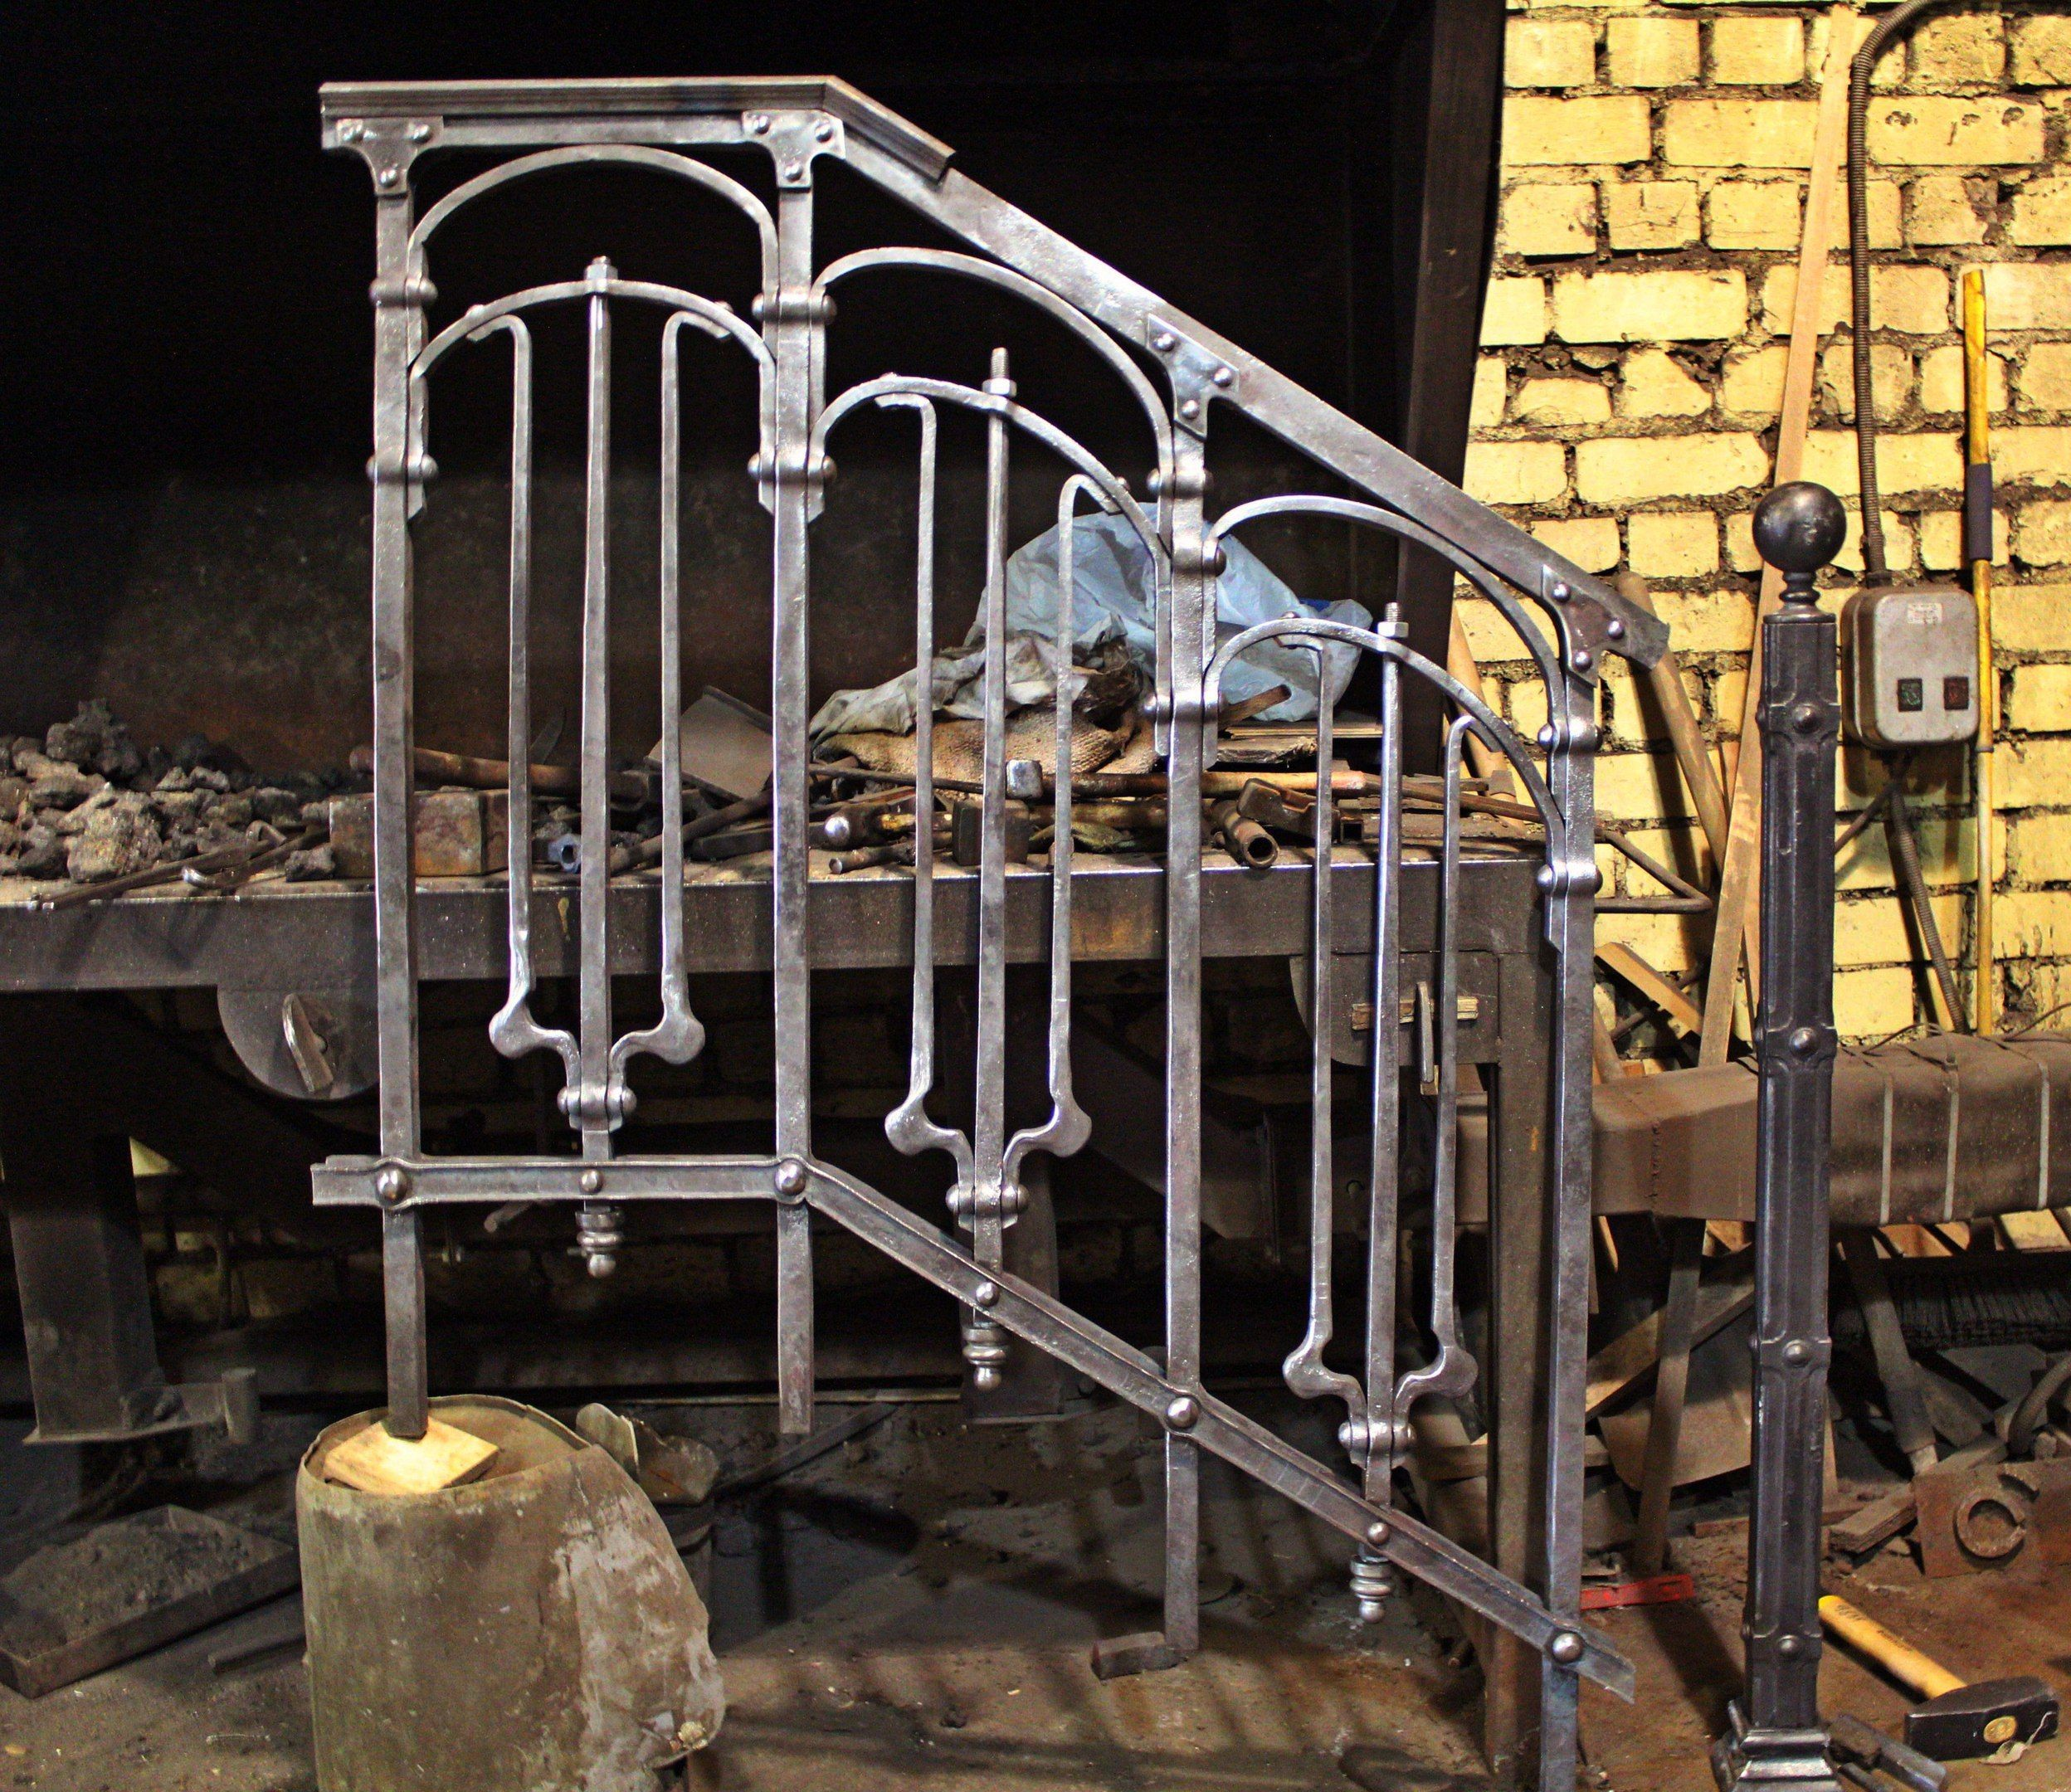 Pin antique garden gates in wrought iron an art nouveau style on - Iron Wrought Iron Railings In Art Nouveau Style